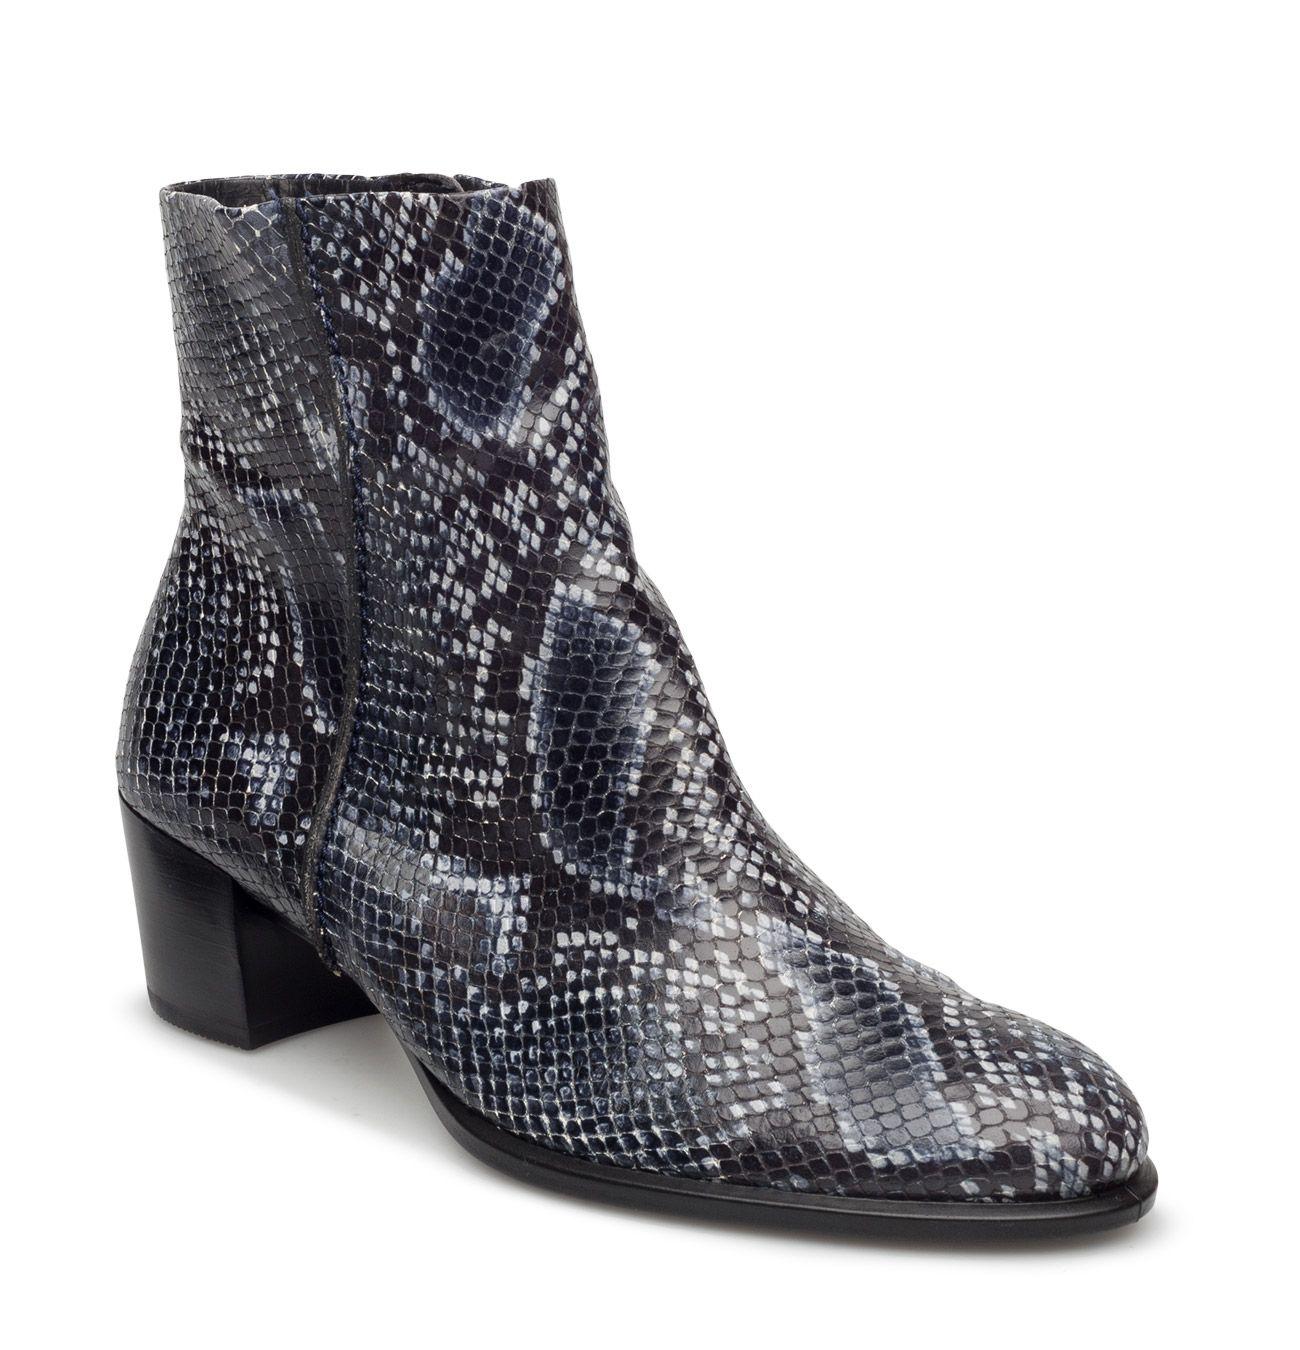 d934b796ec ECCO SHAPE 35 Snake Skin Style Boots Black/Blue | Made for Walkin ...